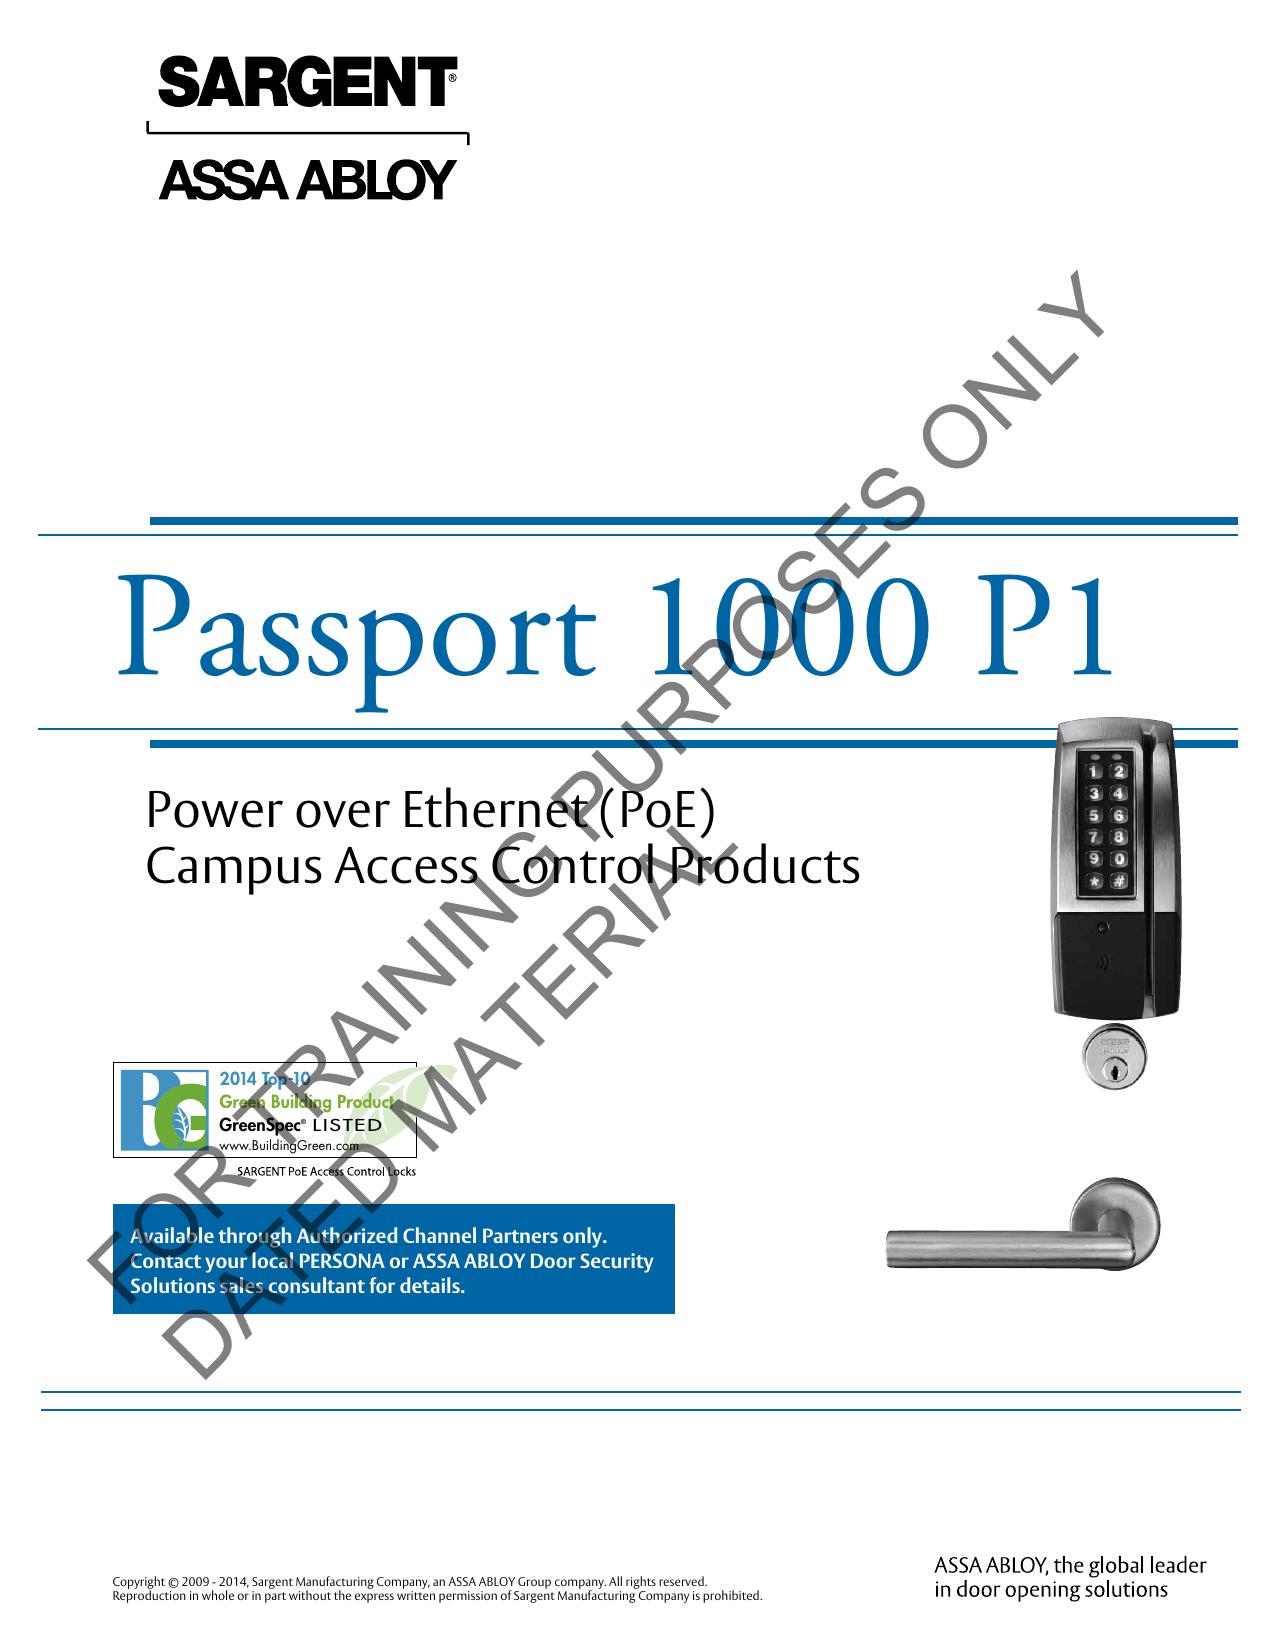 Catalog-Sargent-Passport 1000 P1 | manualzz com